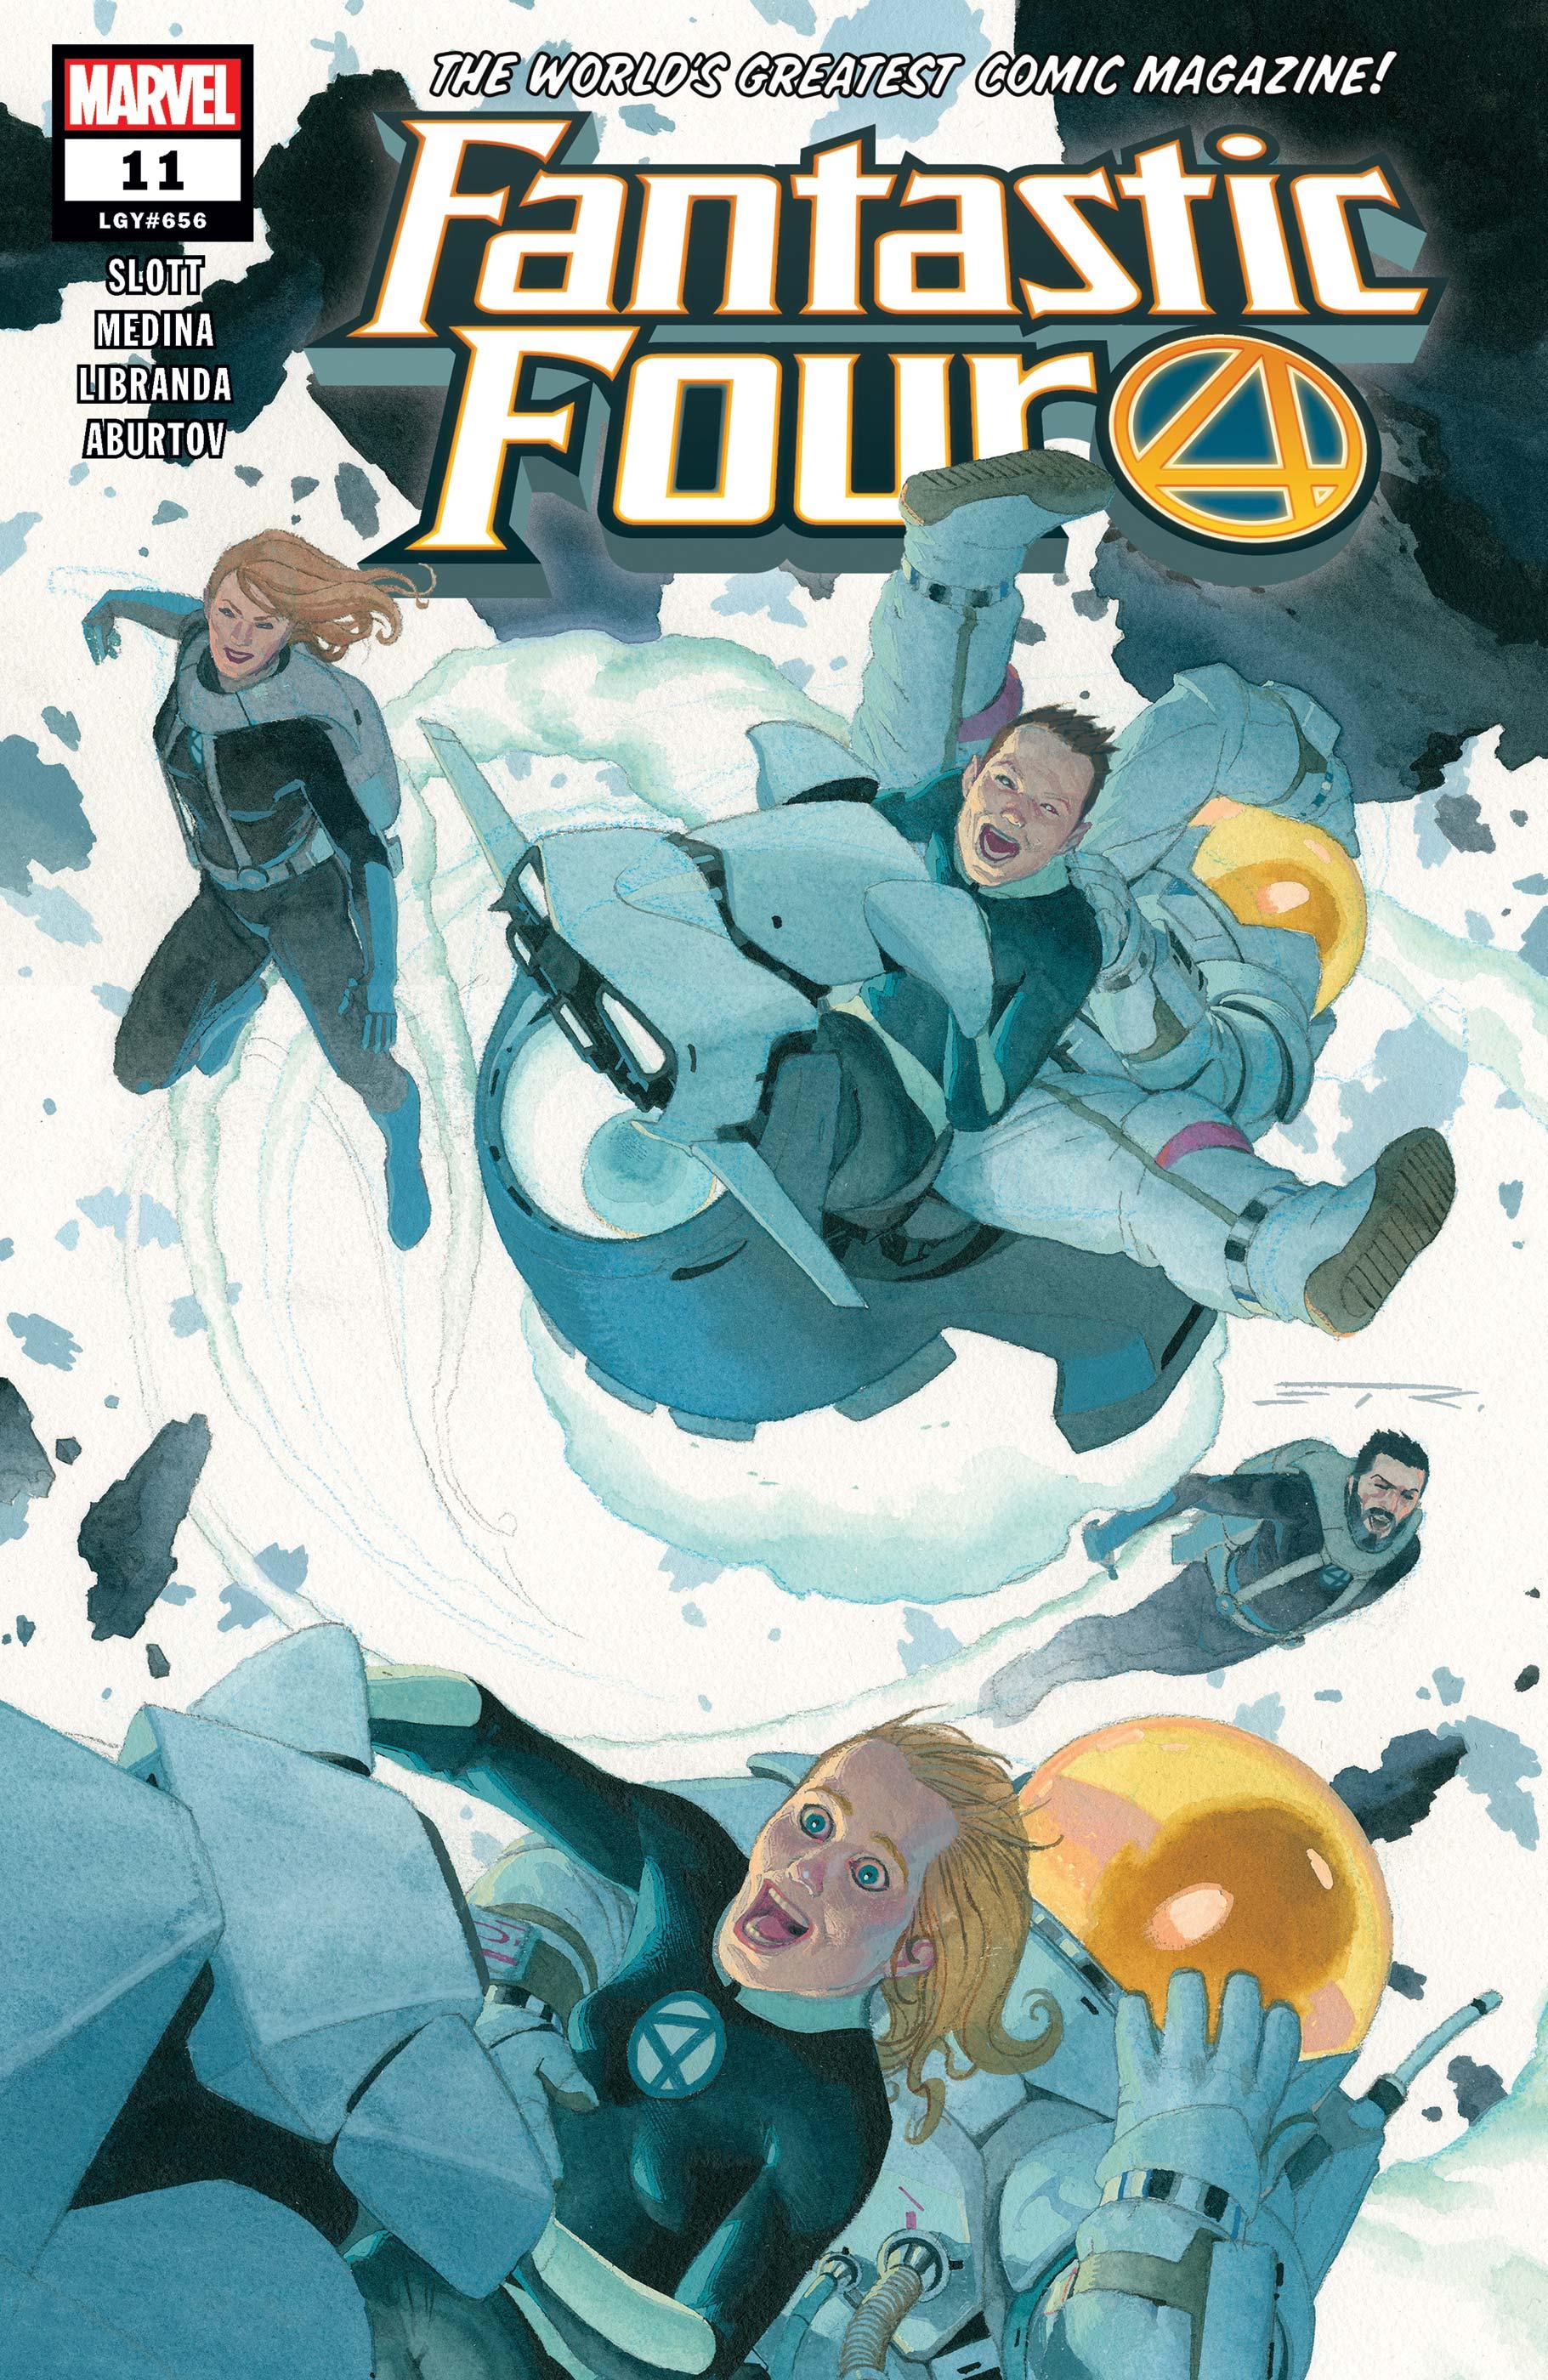 Fantastic Four (2018) #11